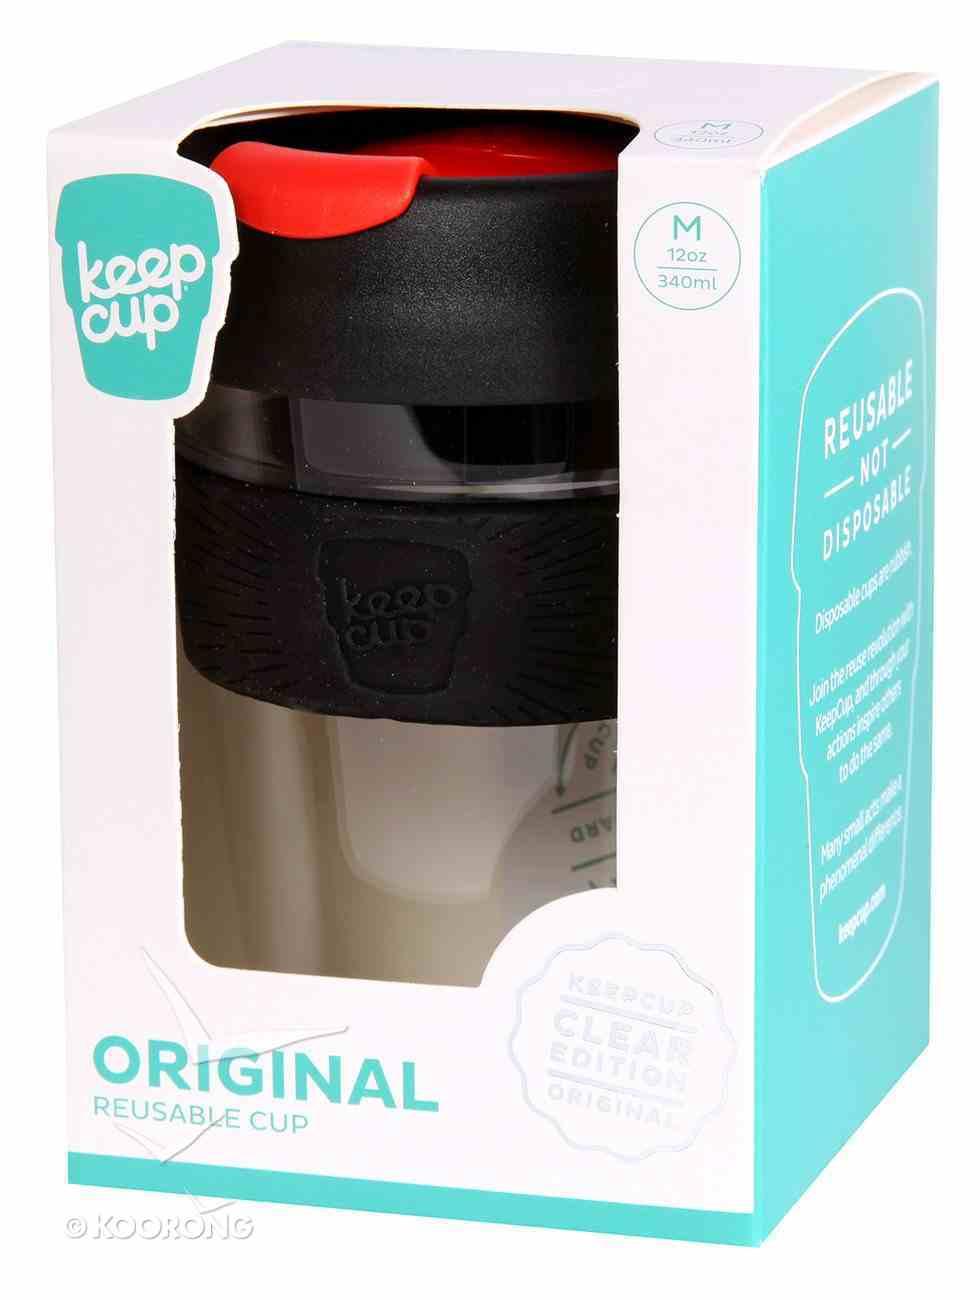 Keep Cup: Original Clear Edition, Medium 12Oz, Black Band & Lid, Vibrant Red Plug Homeware